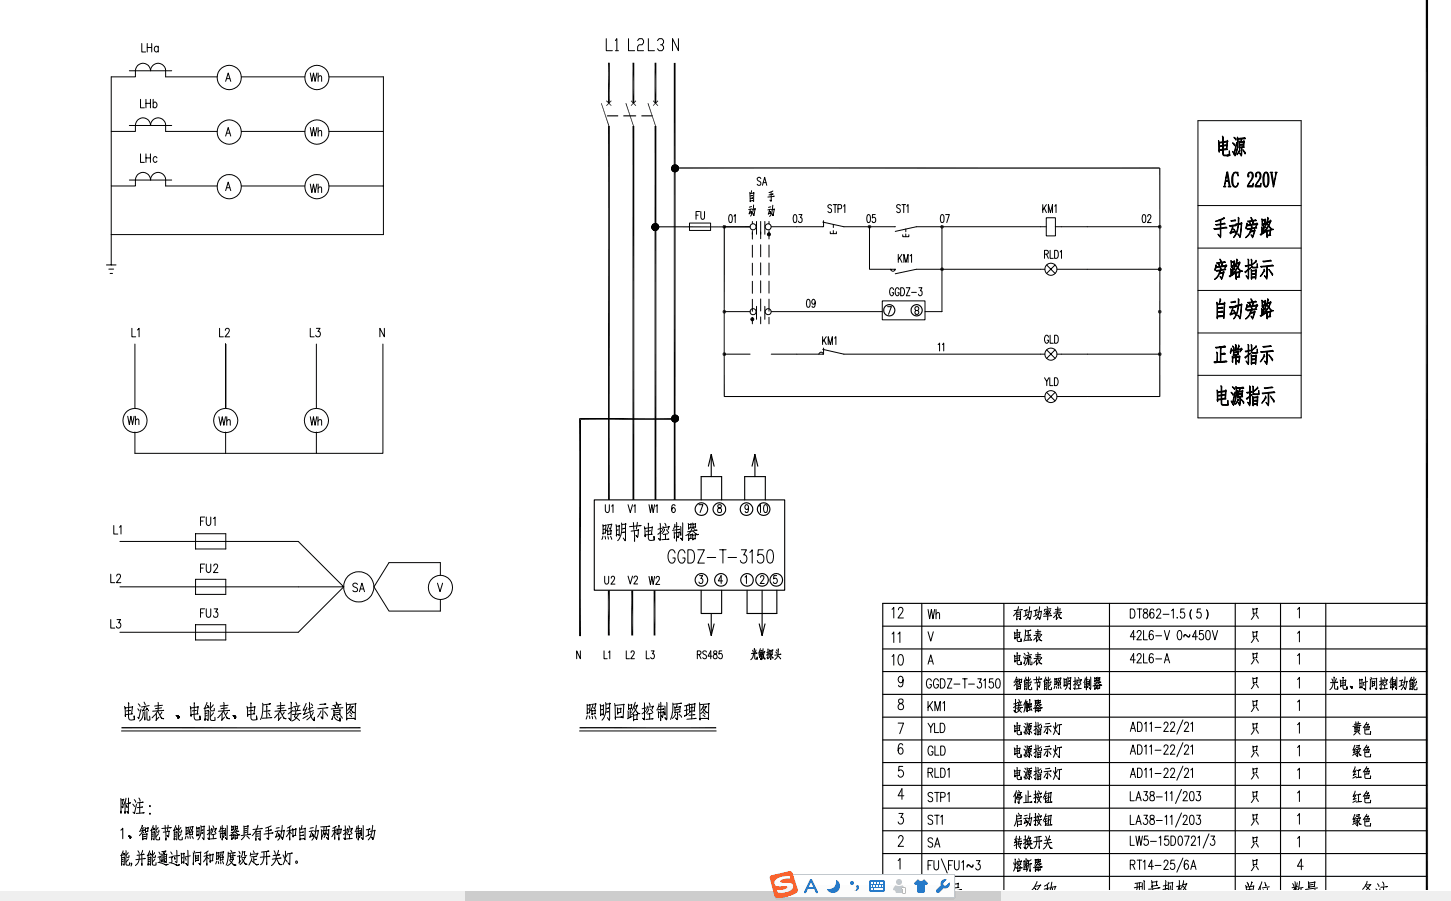 GGDZ-T-3100照明节电控制器